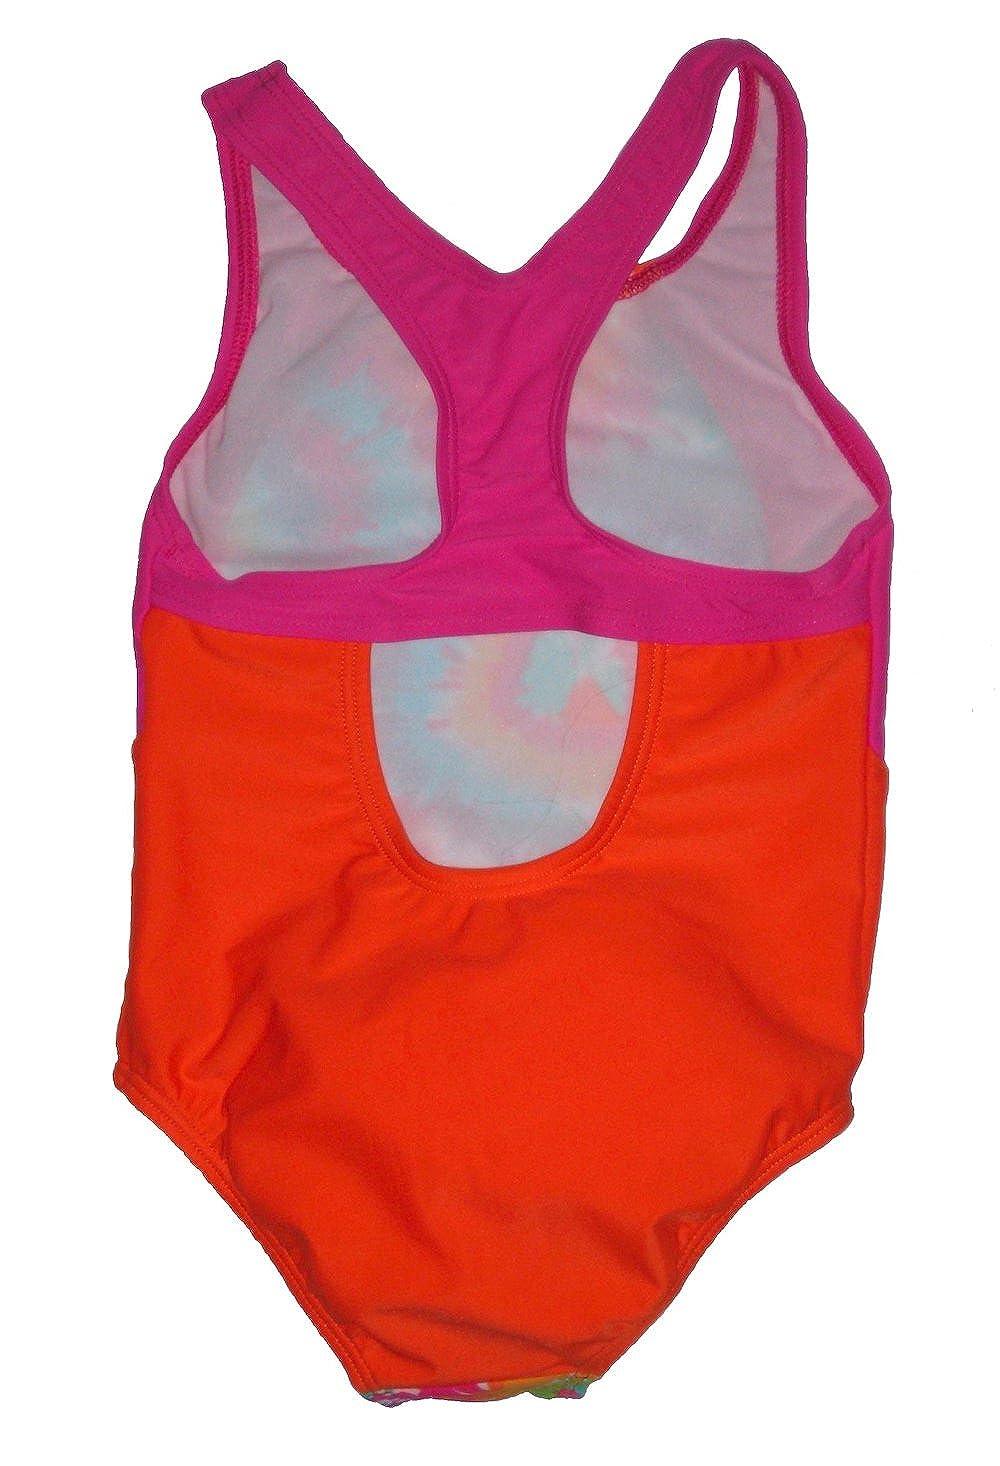 Speedo Girls One Piece Swimsuit Tie dye Pink 5